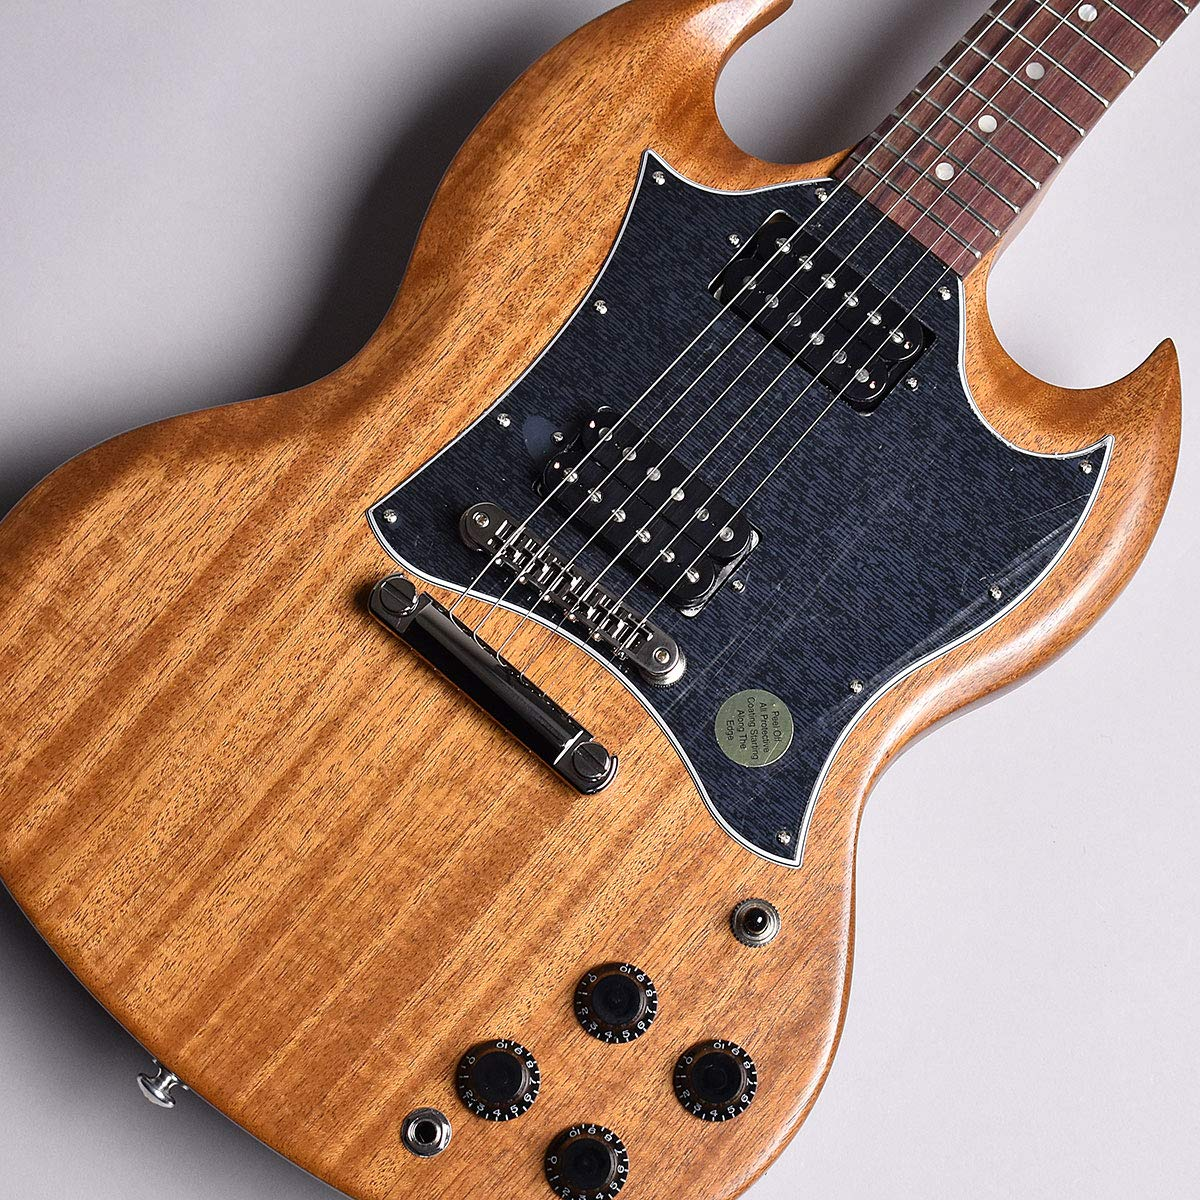 Gibson SG Standard Tribute 2019 Walnut Vintage Gloss S/N:190004988 ギブソン   B07K45R8CT